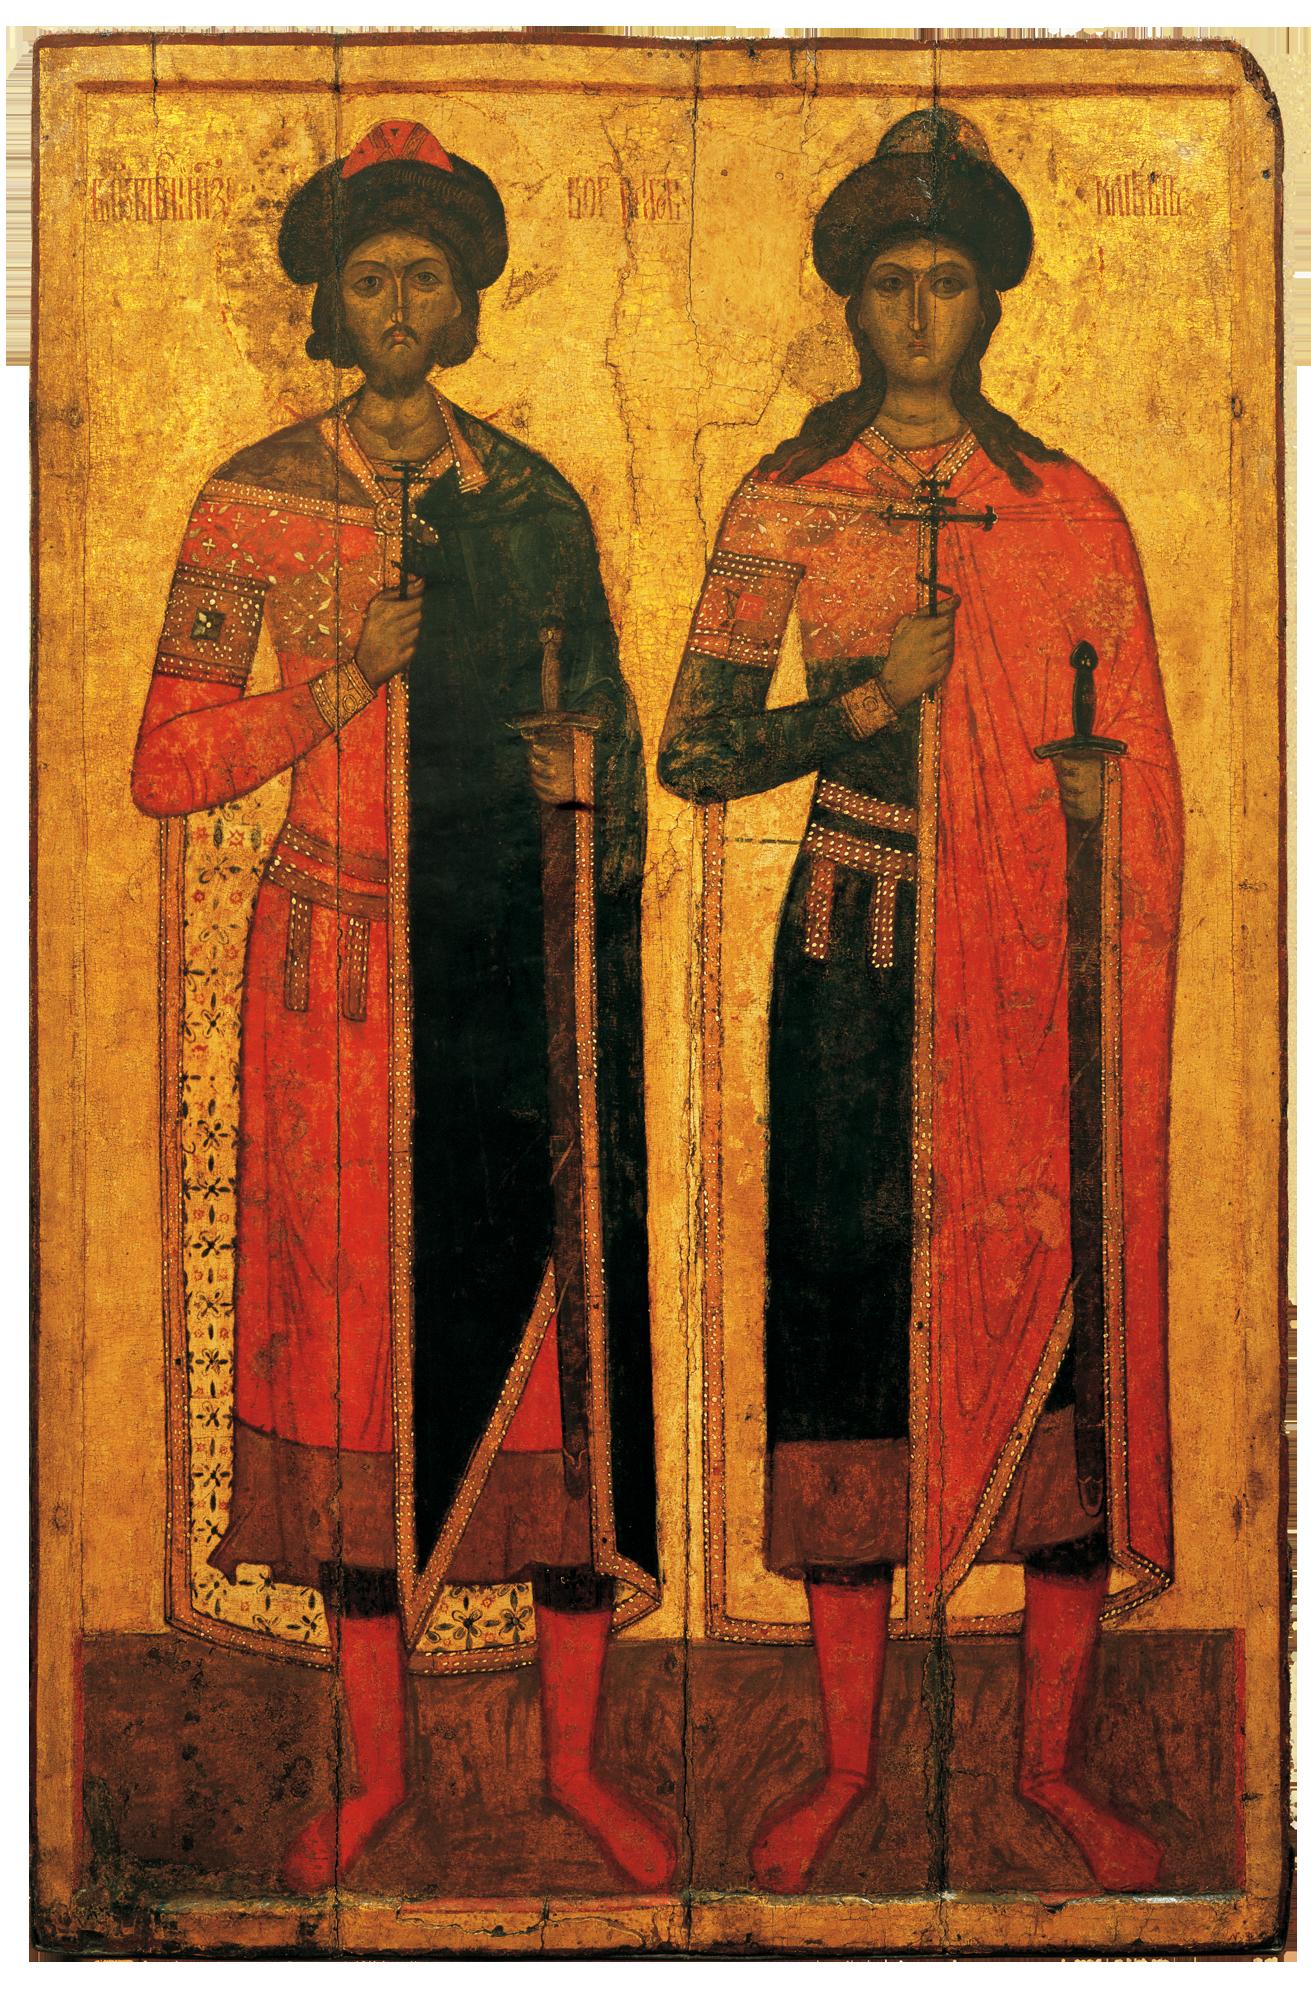 Saints Borys and Hlib